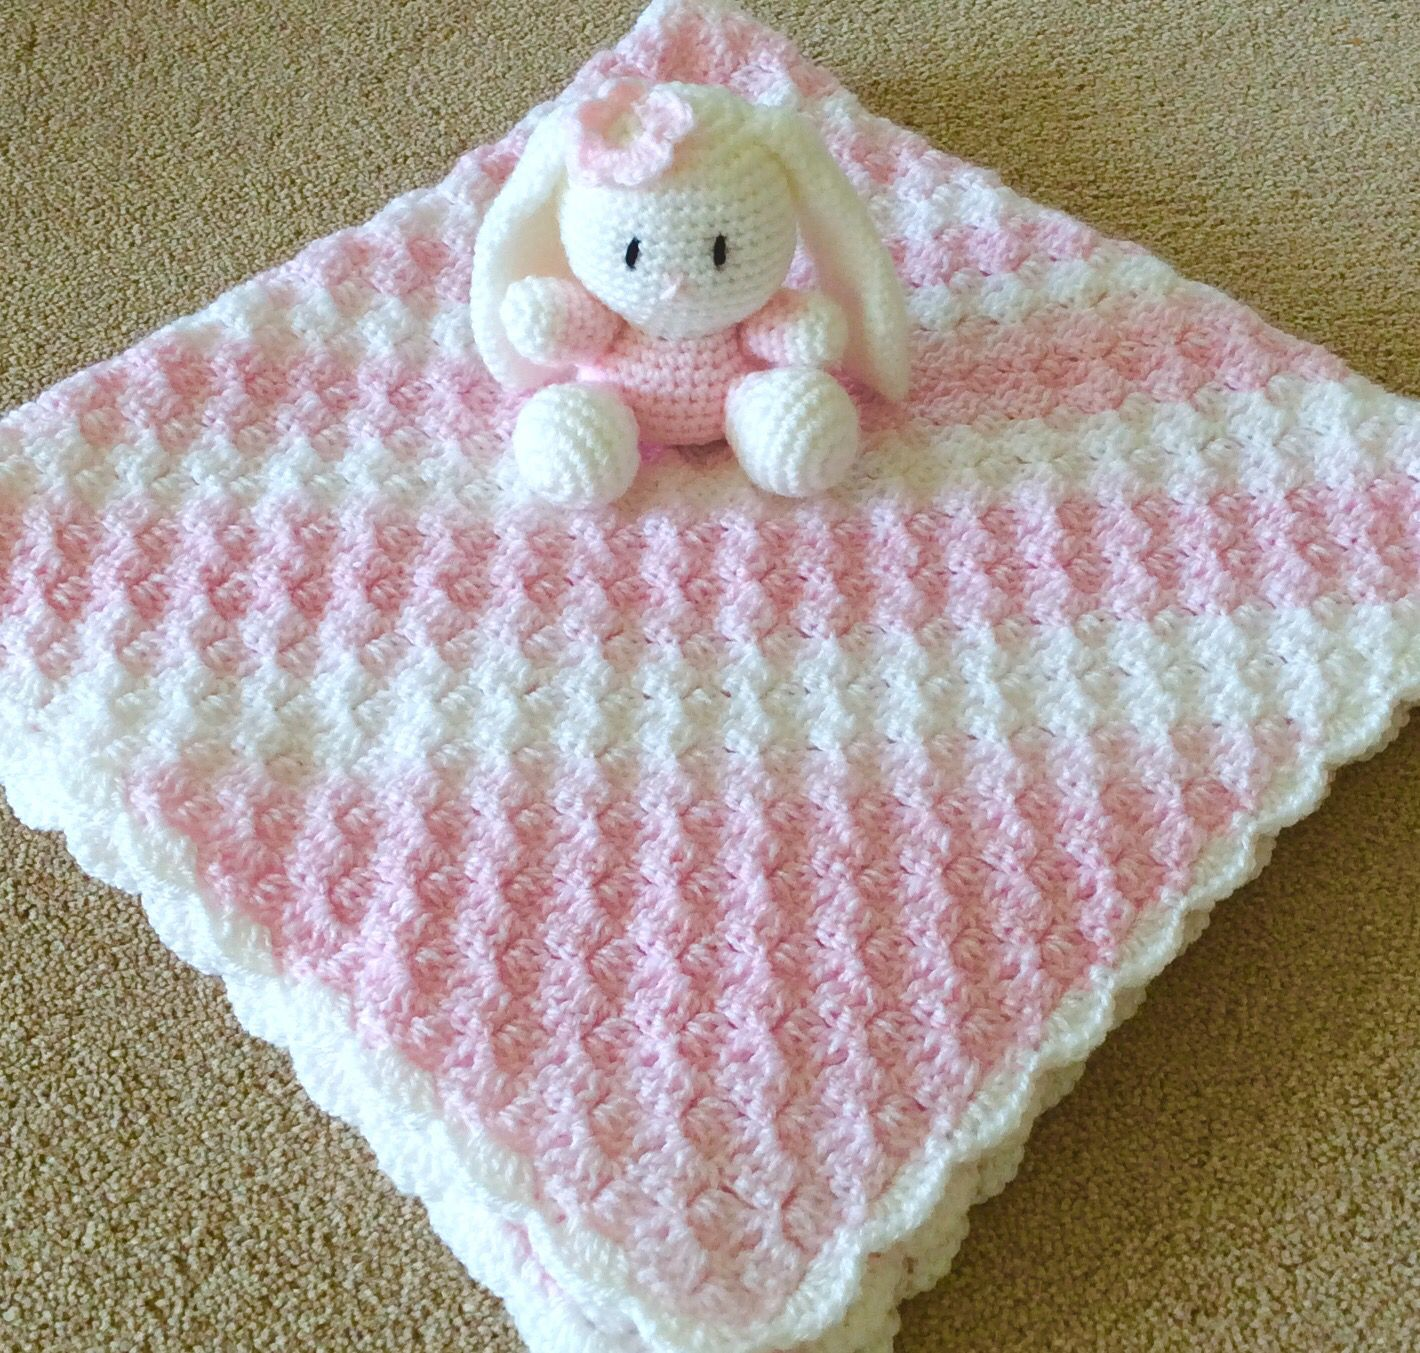 Bunny and blanket | Easy crochet patterns, Crochet blanket ...